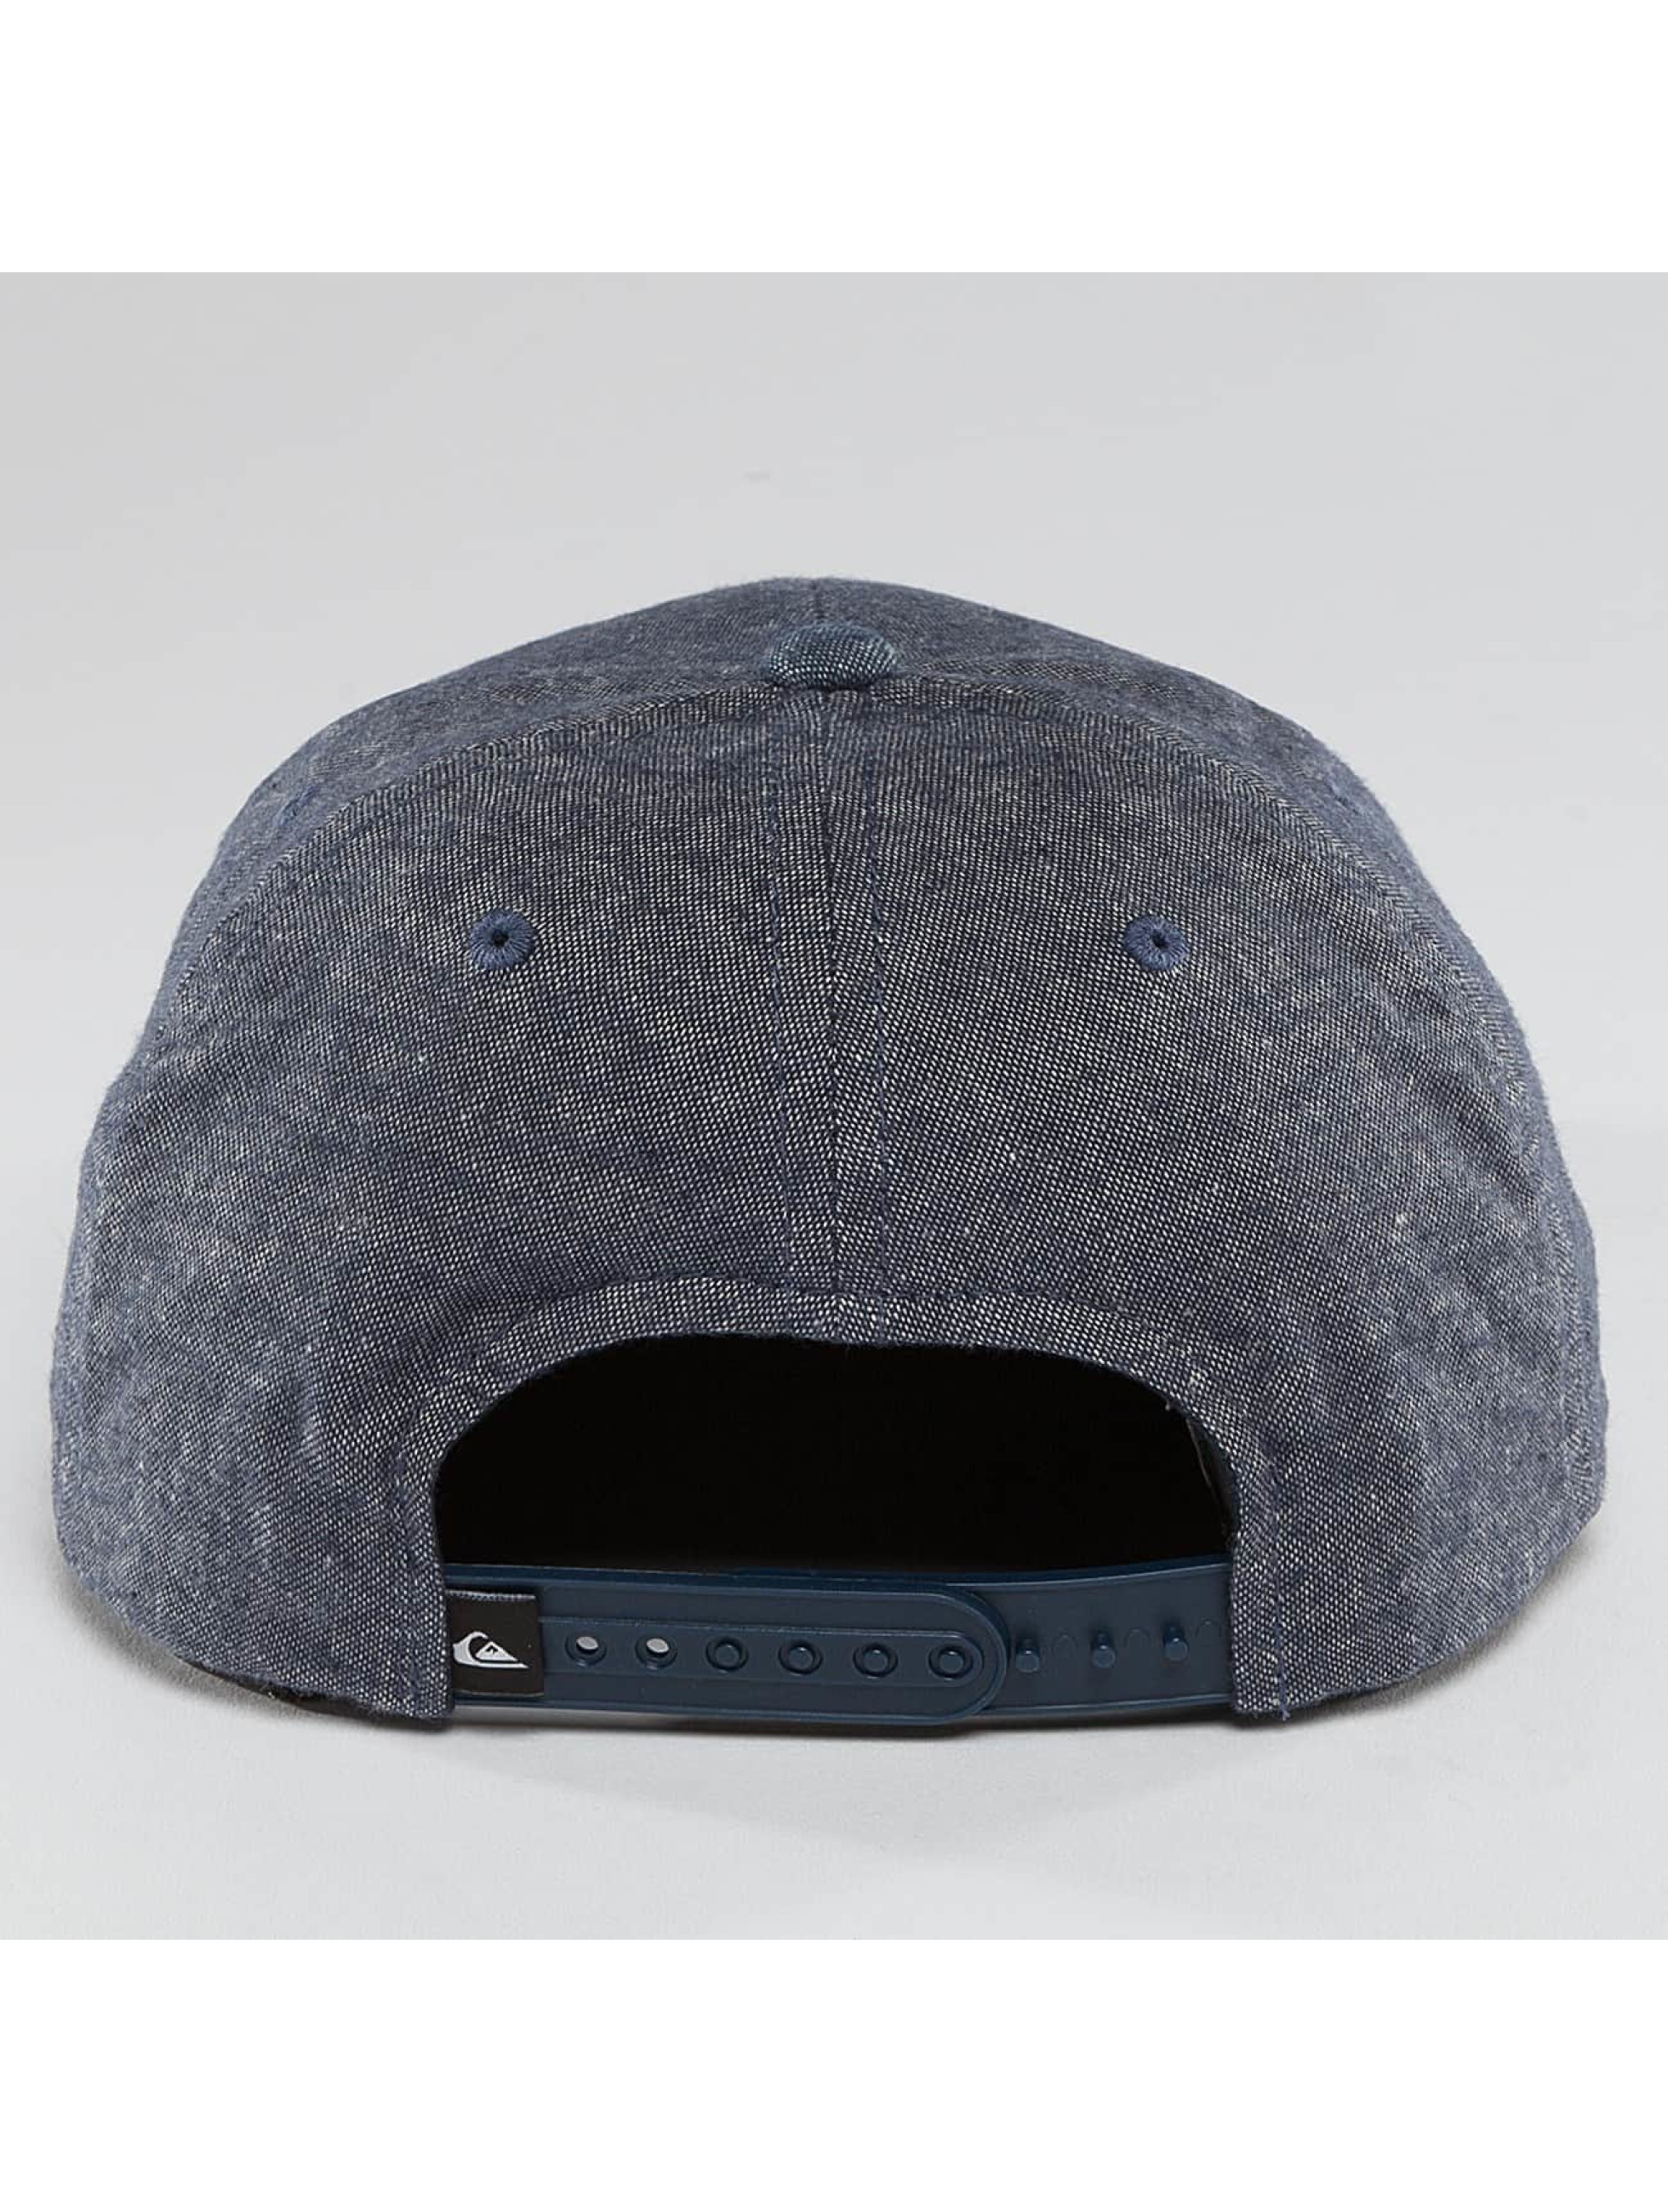 Quiksilver Gorra Snapback Decades Plus azul